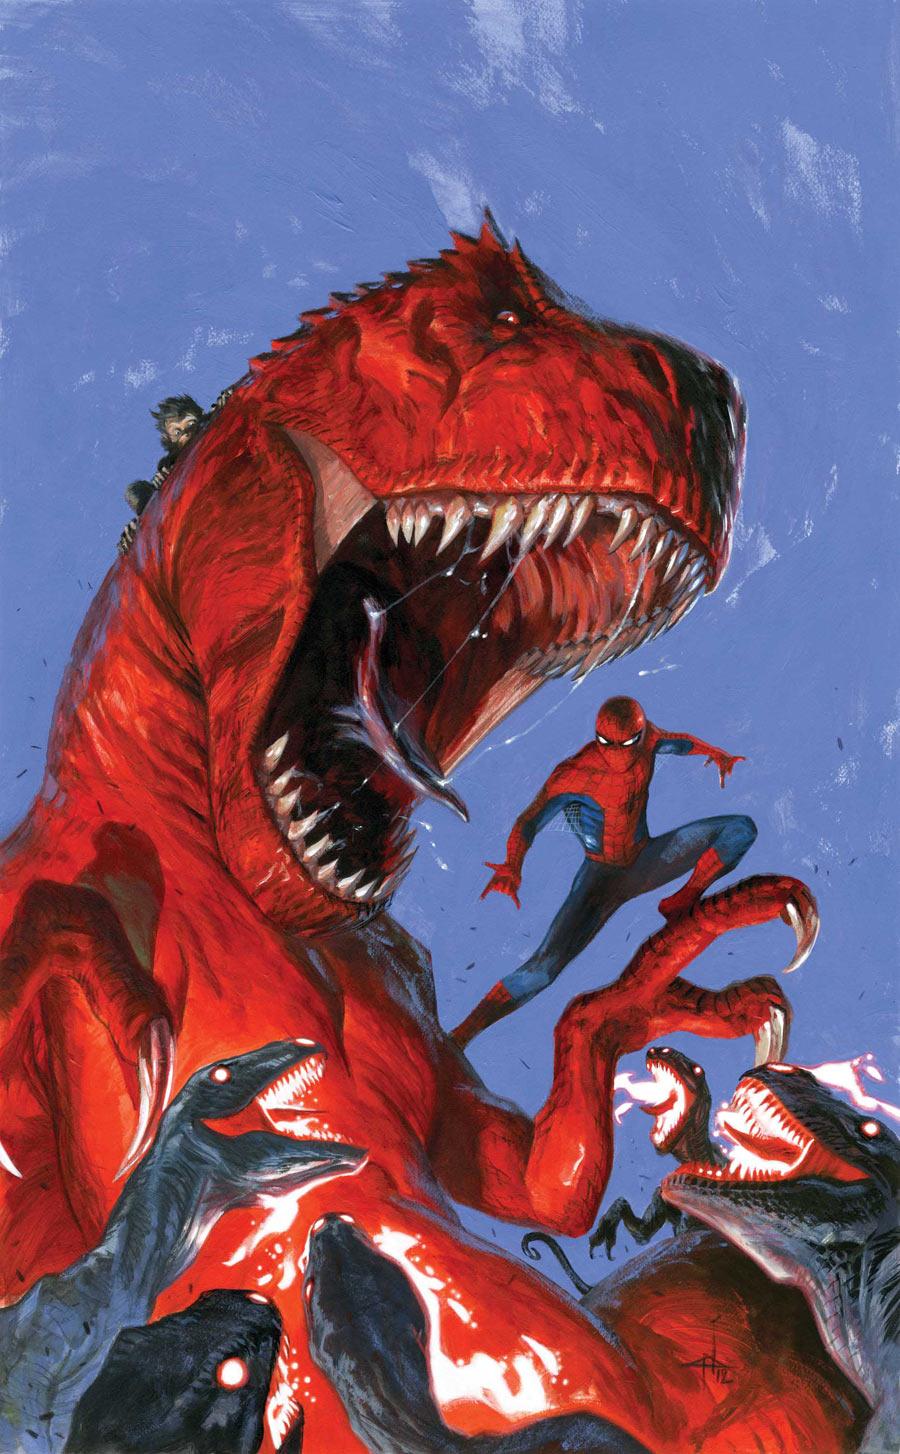 Devil Dinosaur: Needless Character Analysis